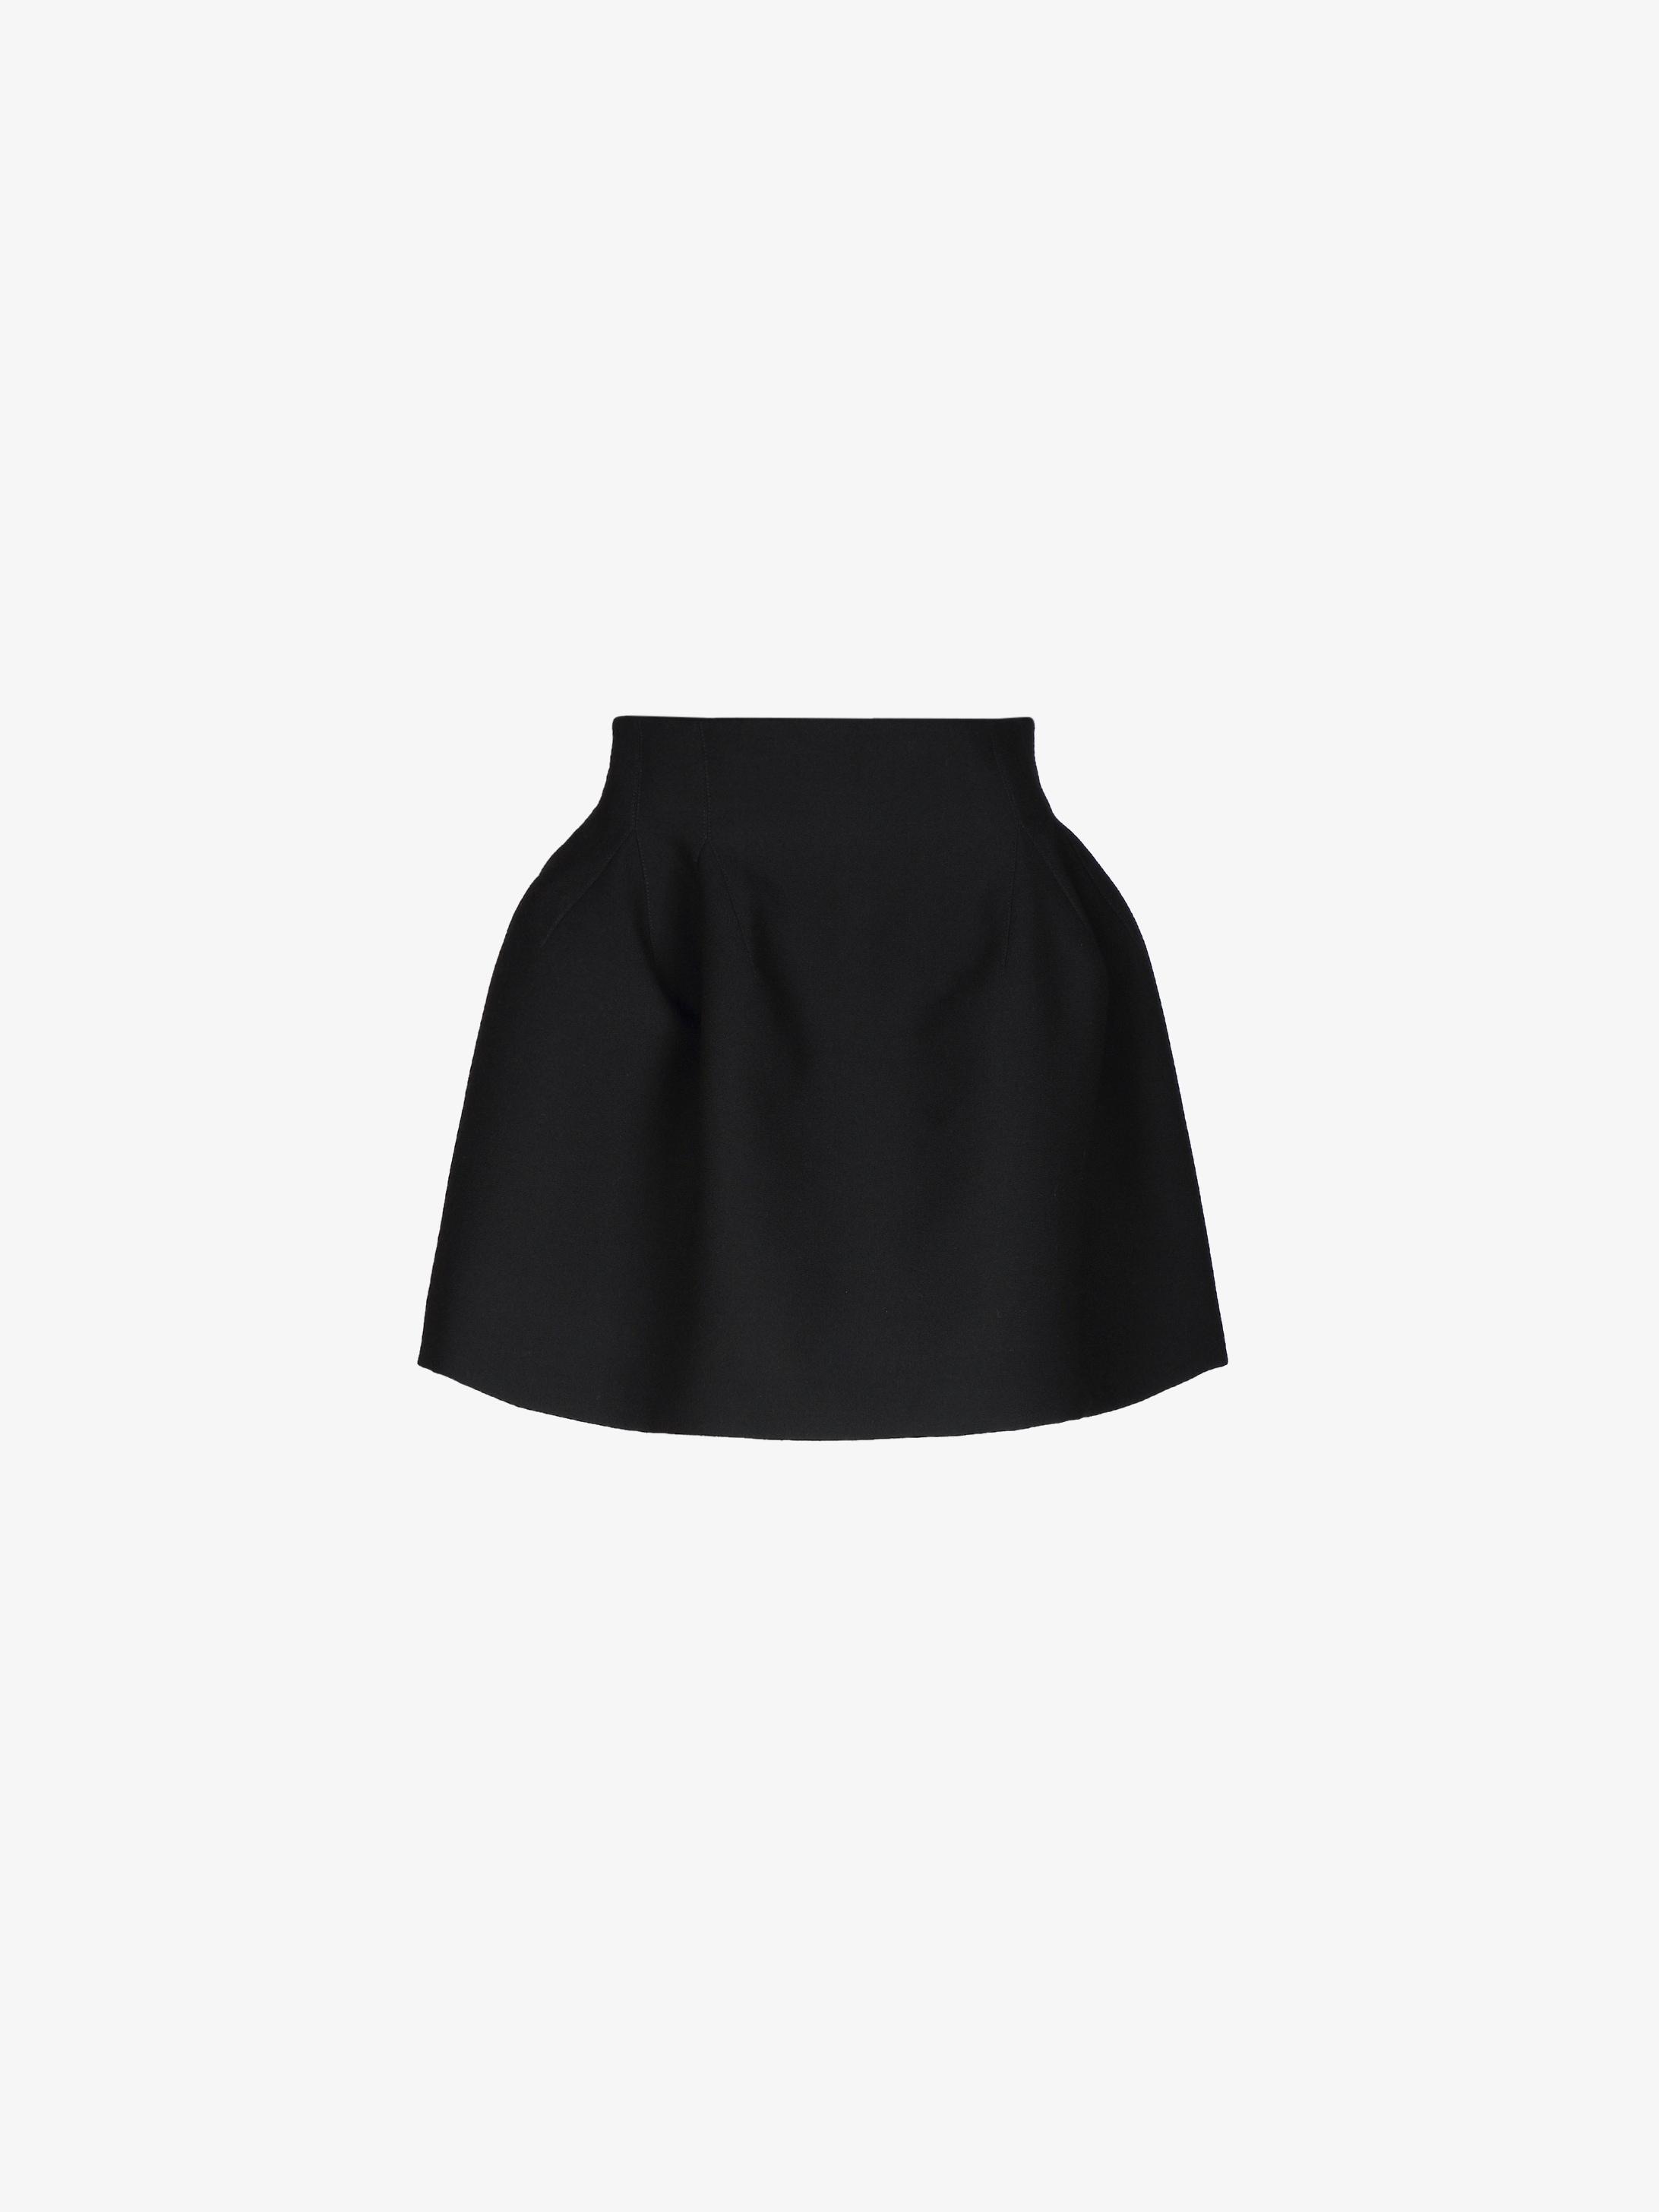 Mini basque skirt in crepe